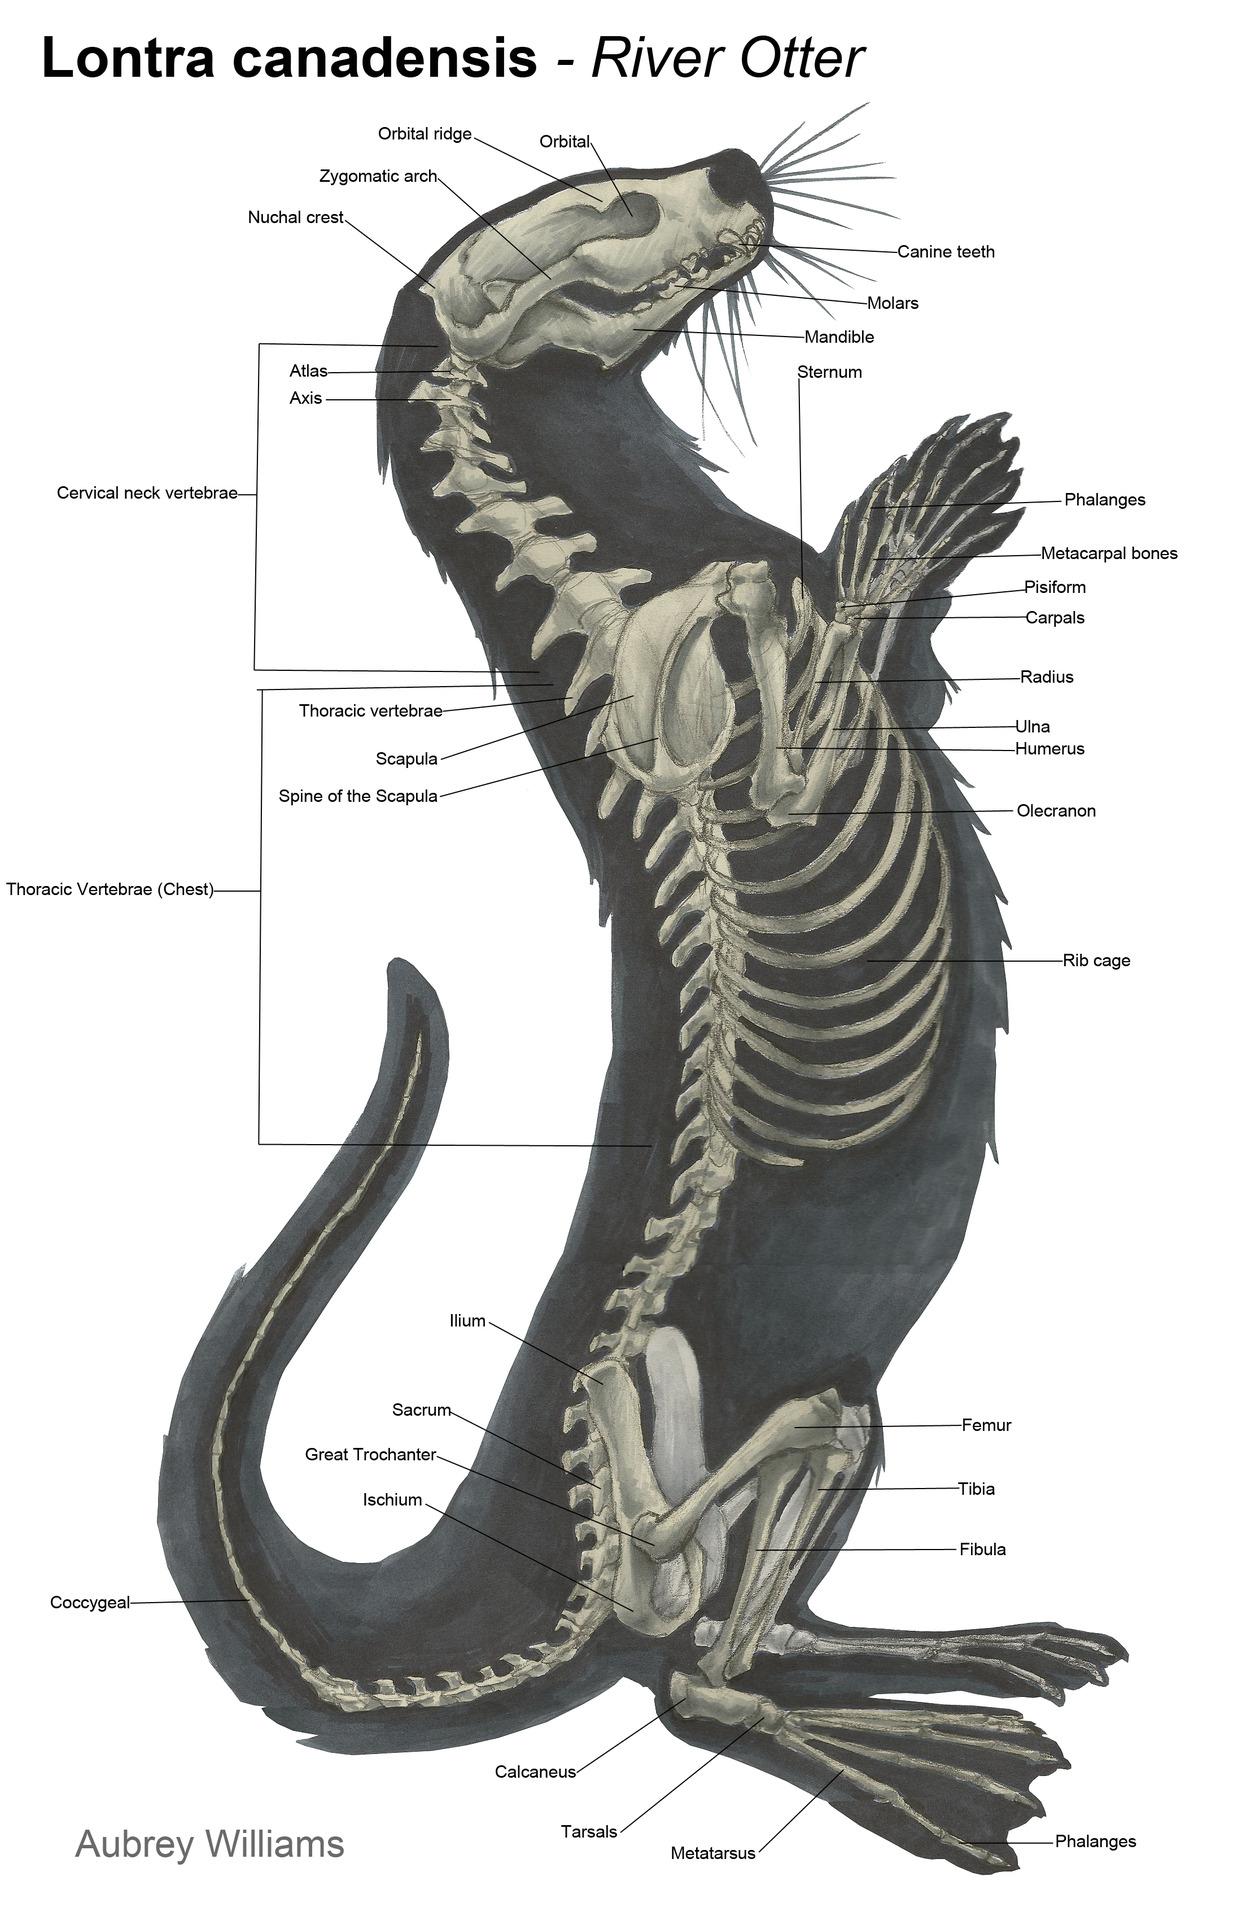 skunk anatomy diagram visio virtual machine skeletal system  lifelong learning with ot